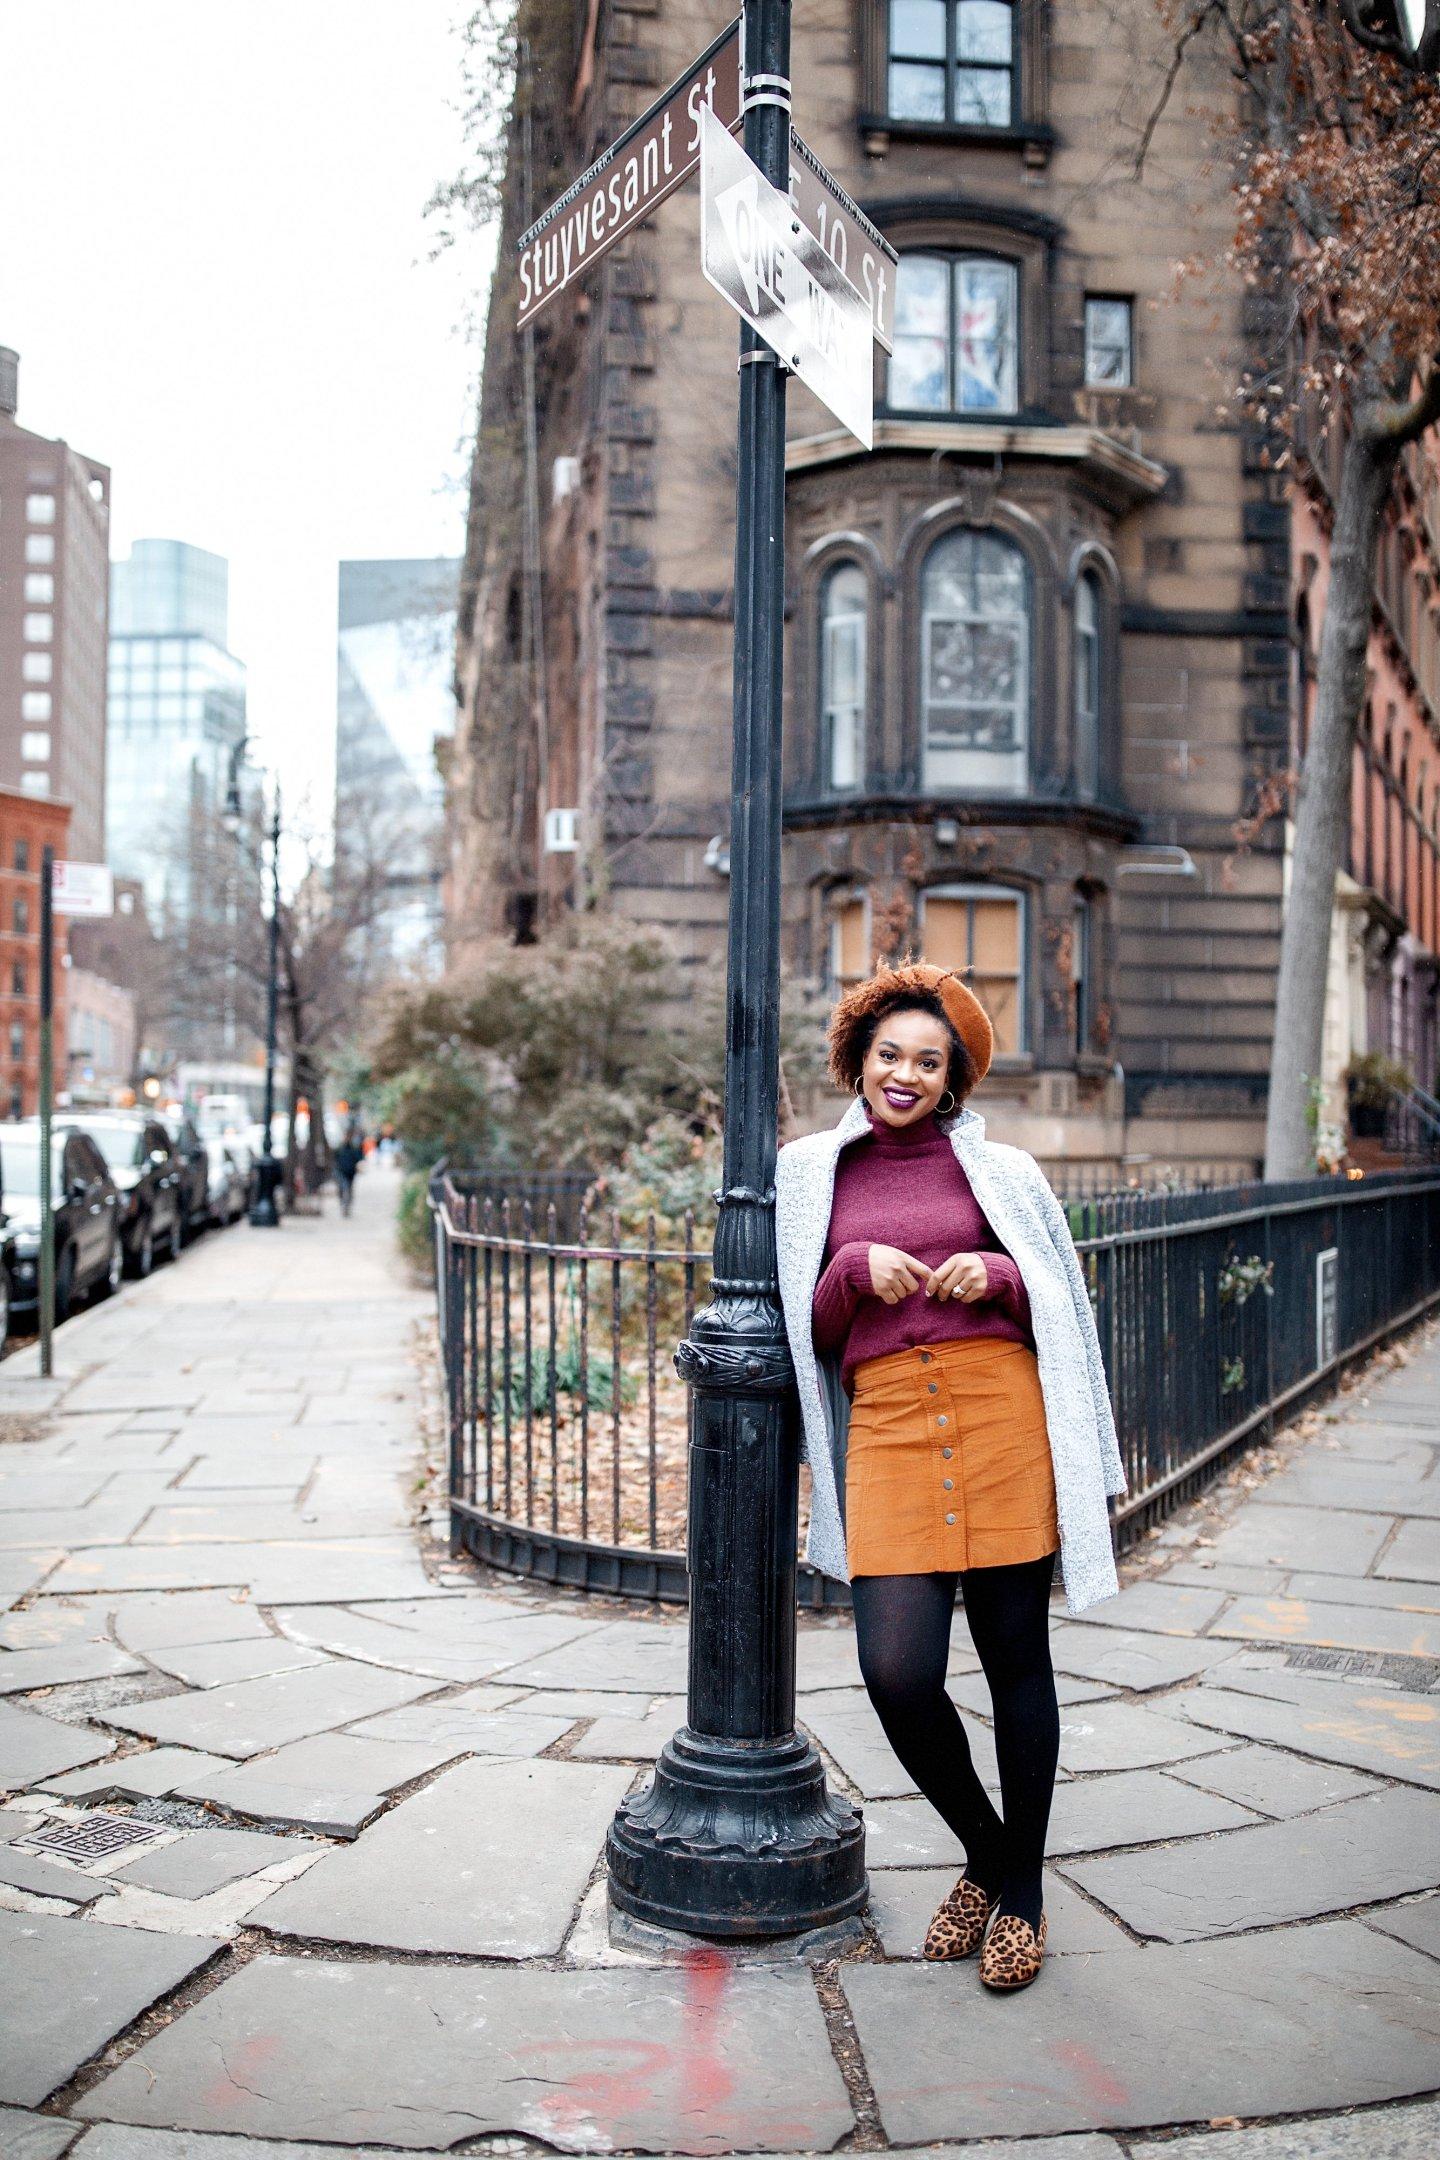 NYC Fashion Blogger Ijeoma Kola wearing Fall Outfit Madewell Burgundy Turtleneck Mustard Skirt Leopard Loafers Beret and LOFT Grey Coat